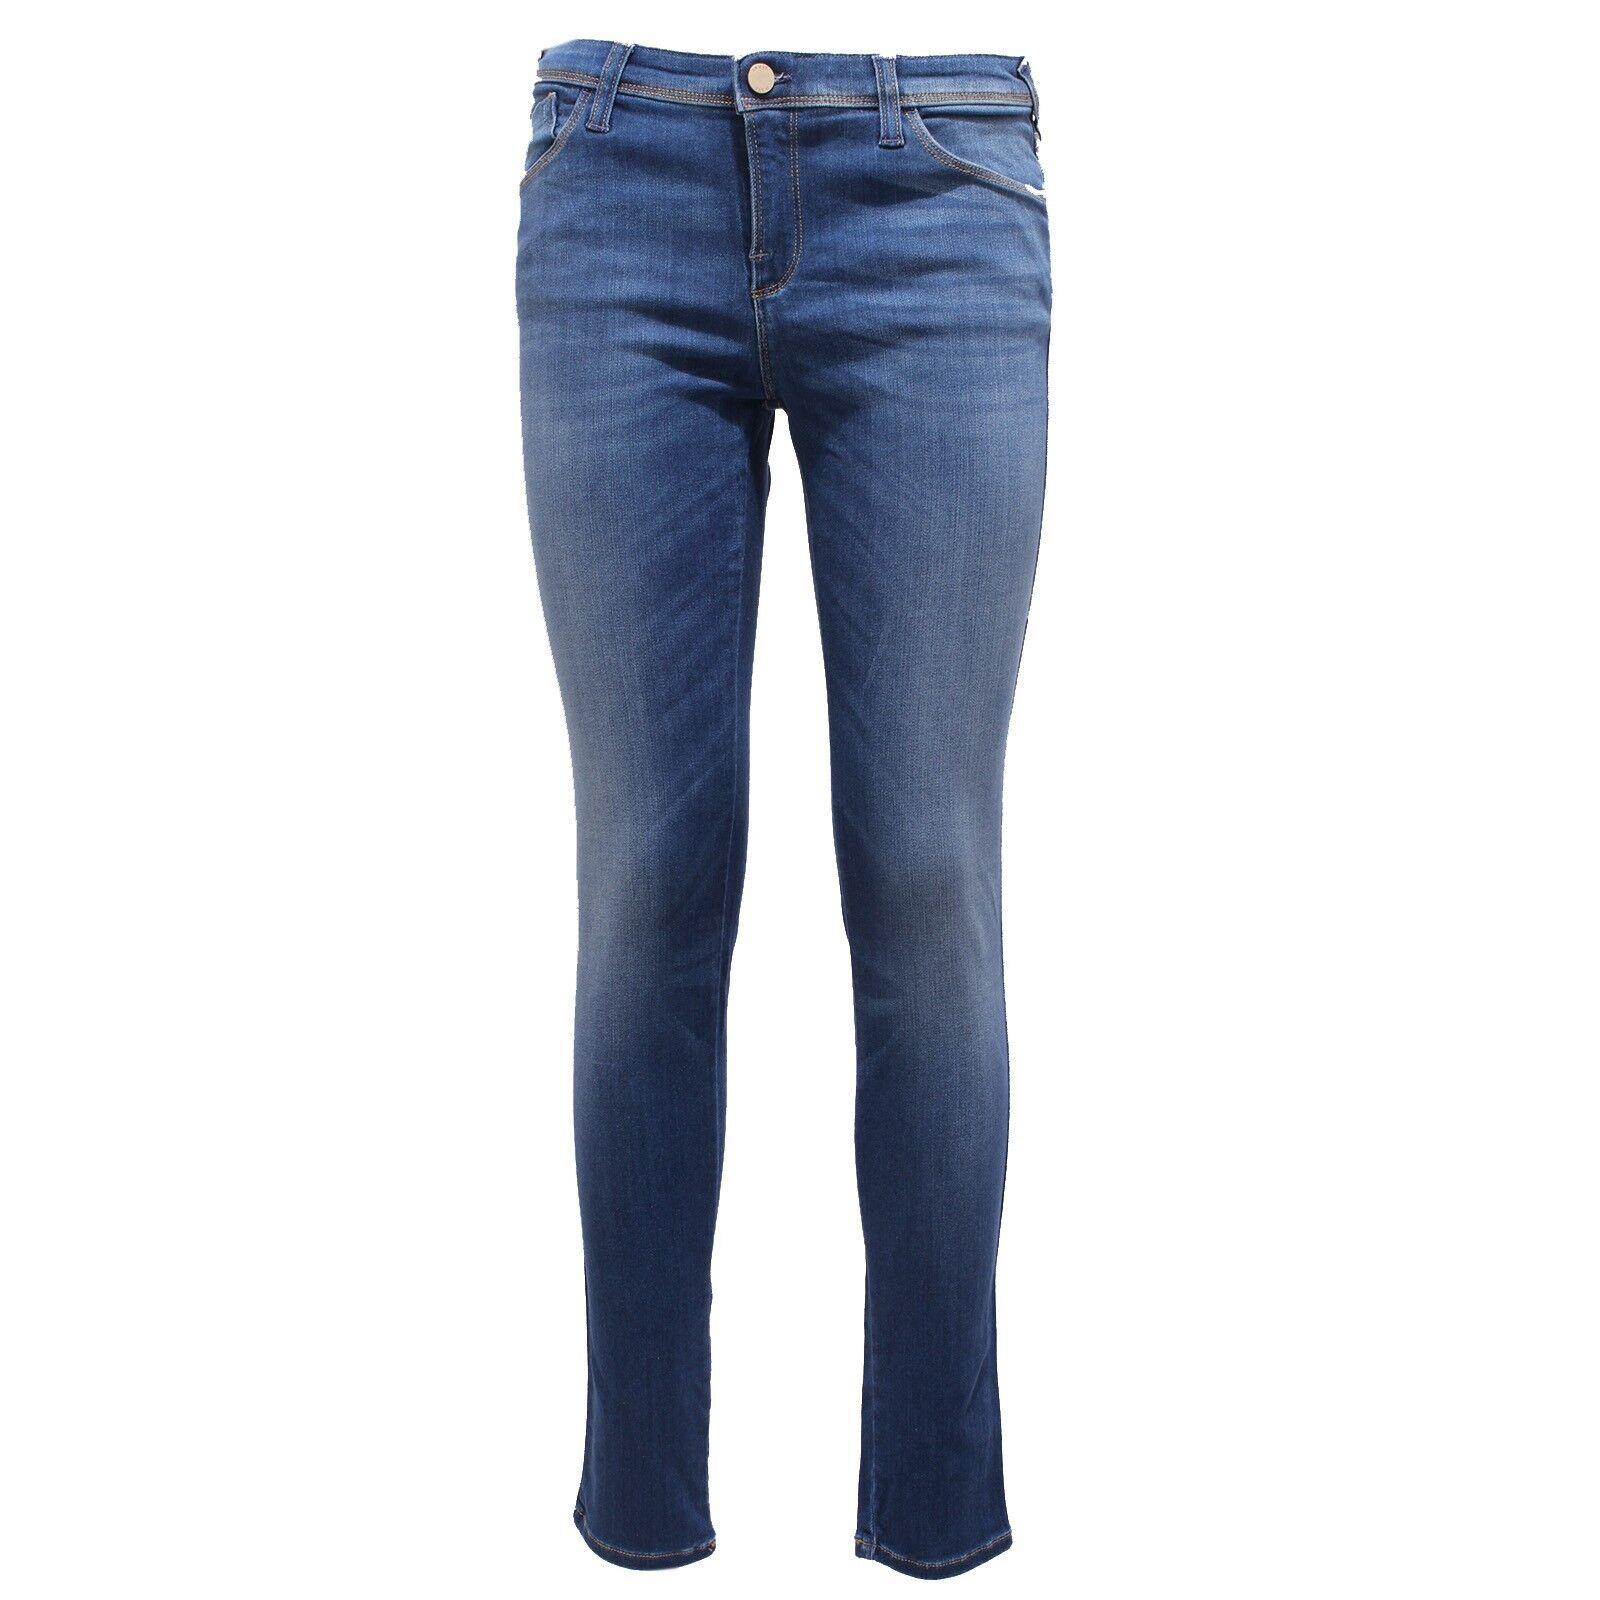 6569Y jeans donna blu denim ARMANI JEANS J28 trouser Donna